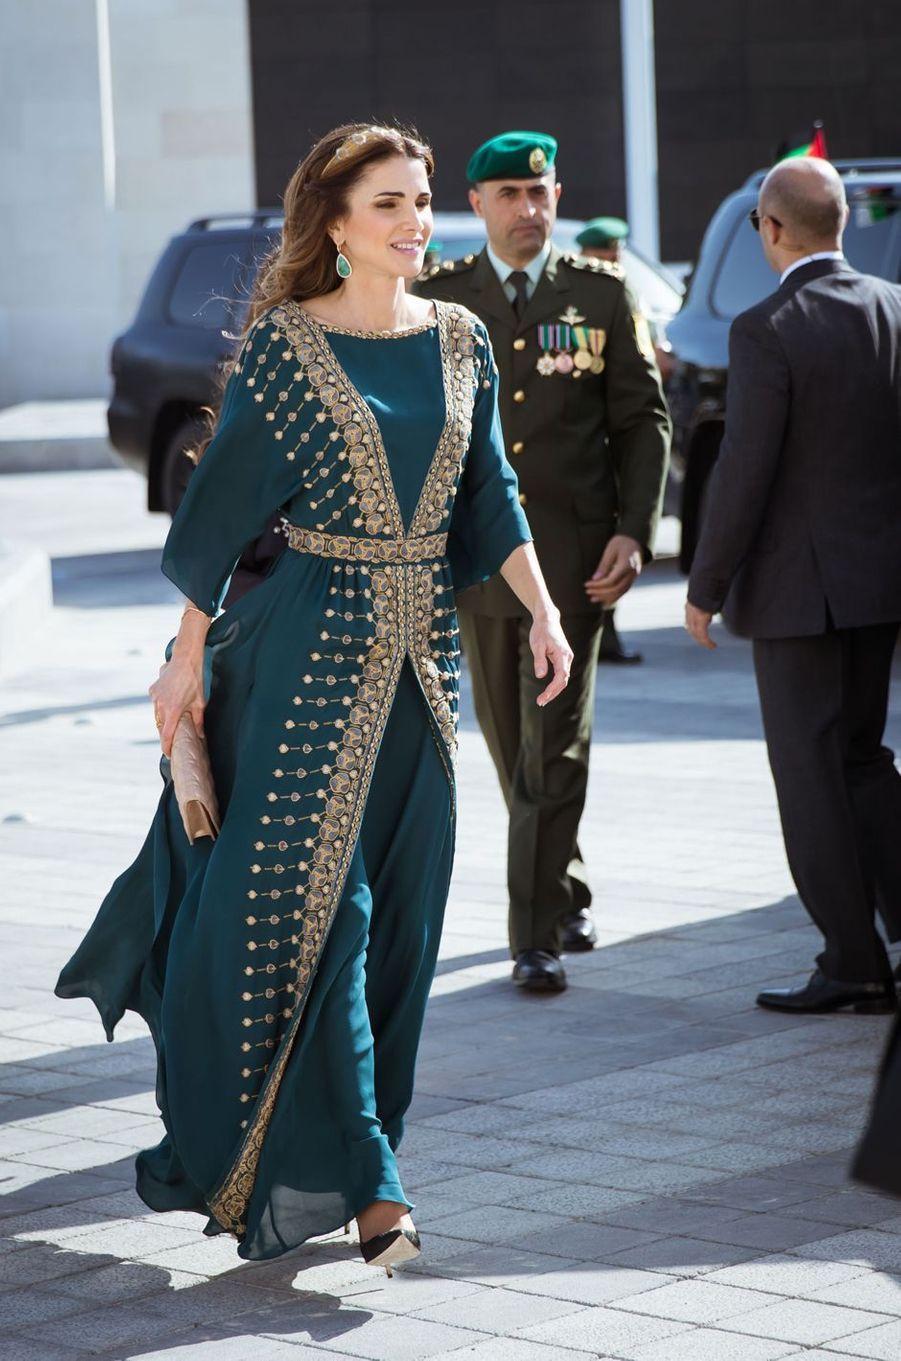 La reine Rania de Jordanie à Amman, le 2 juin 2016